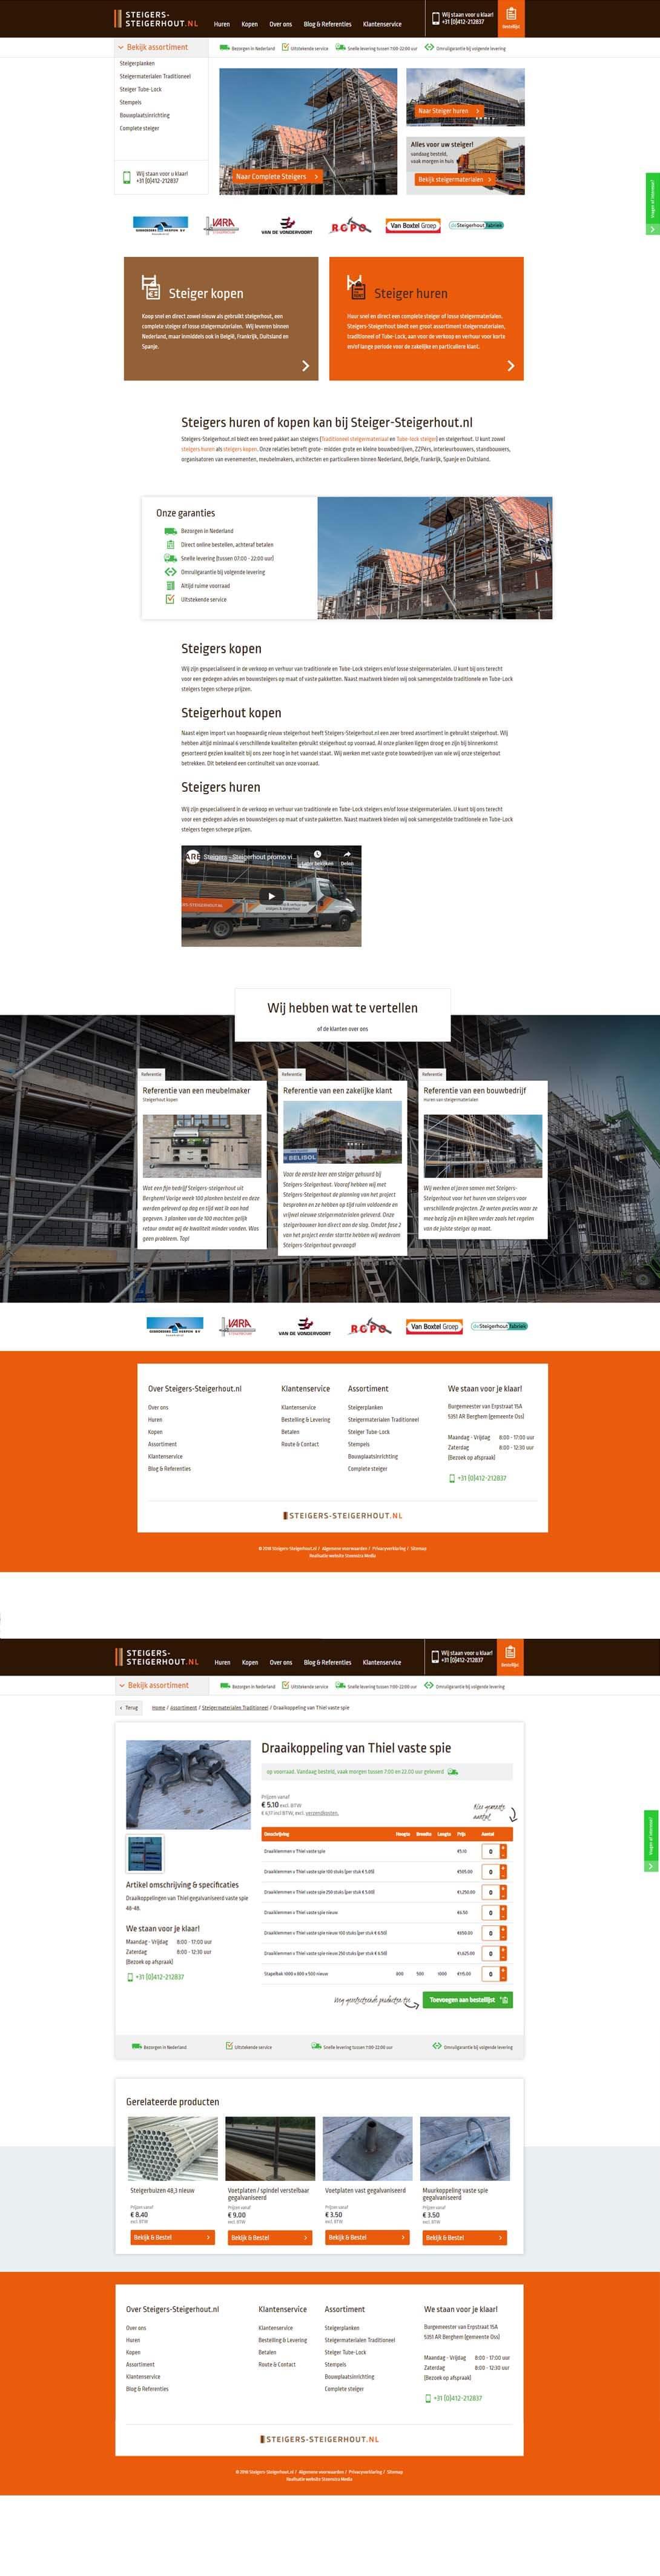 Webshop-laten-maken-WooCommerce-Someren-Steiger-Steigerhout-v2